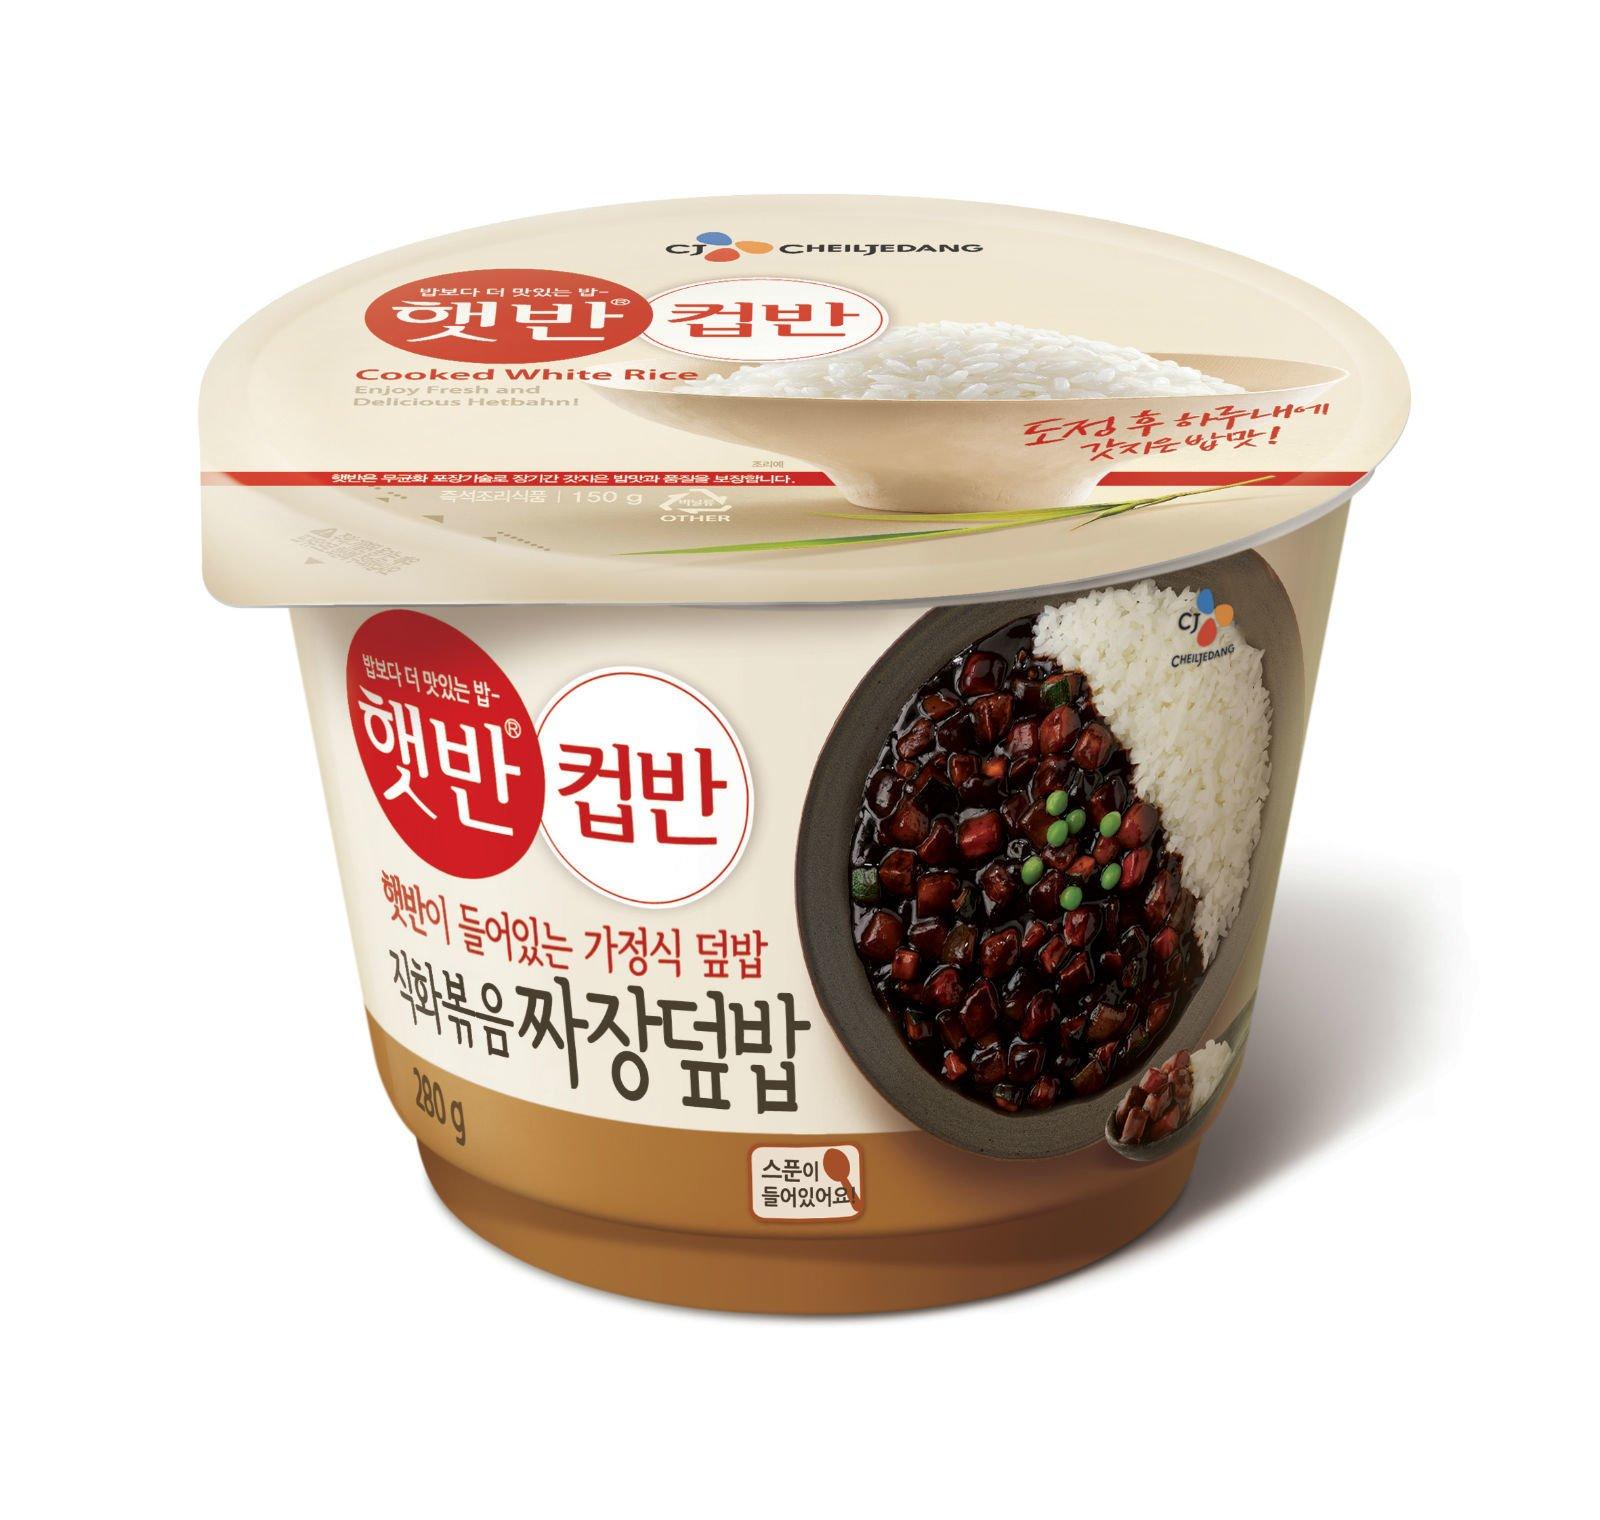 CJ Cupbahn Hatbahn Microwavable Rice Bowls (Black Bean Sauce (짜장덮밥), 2 Pack)